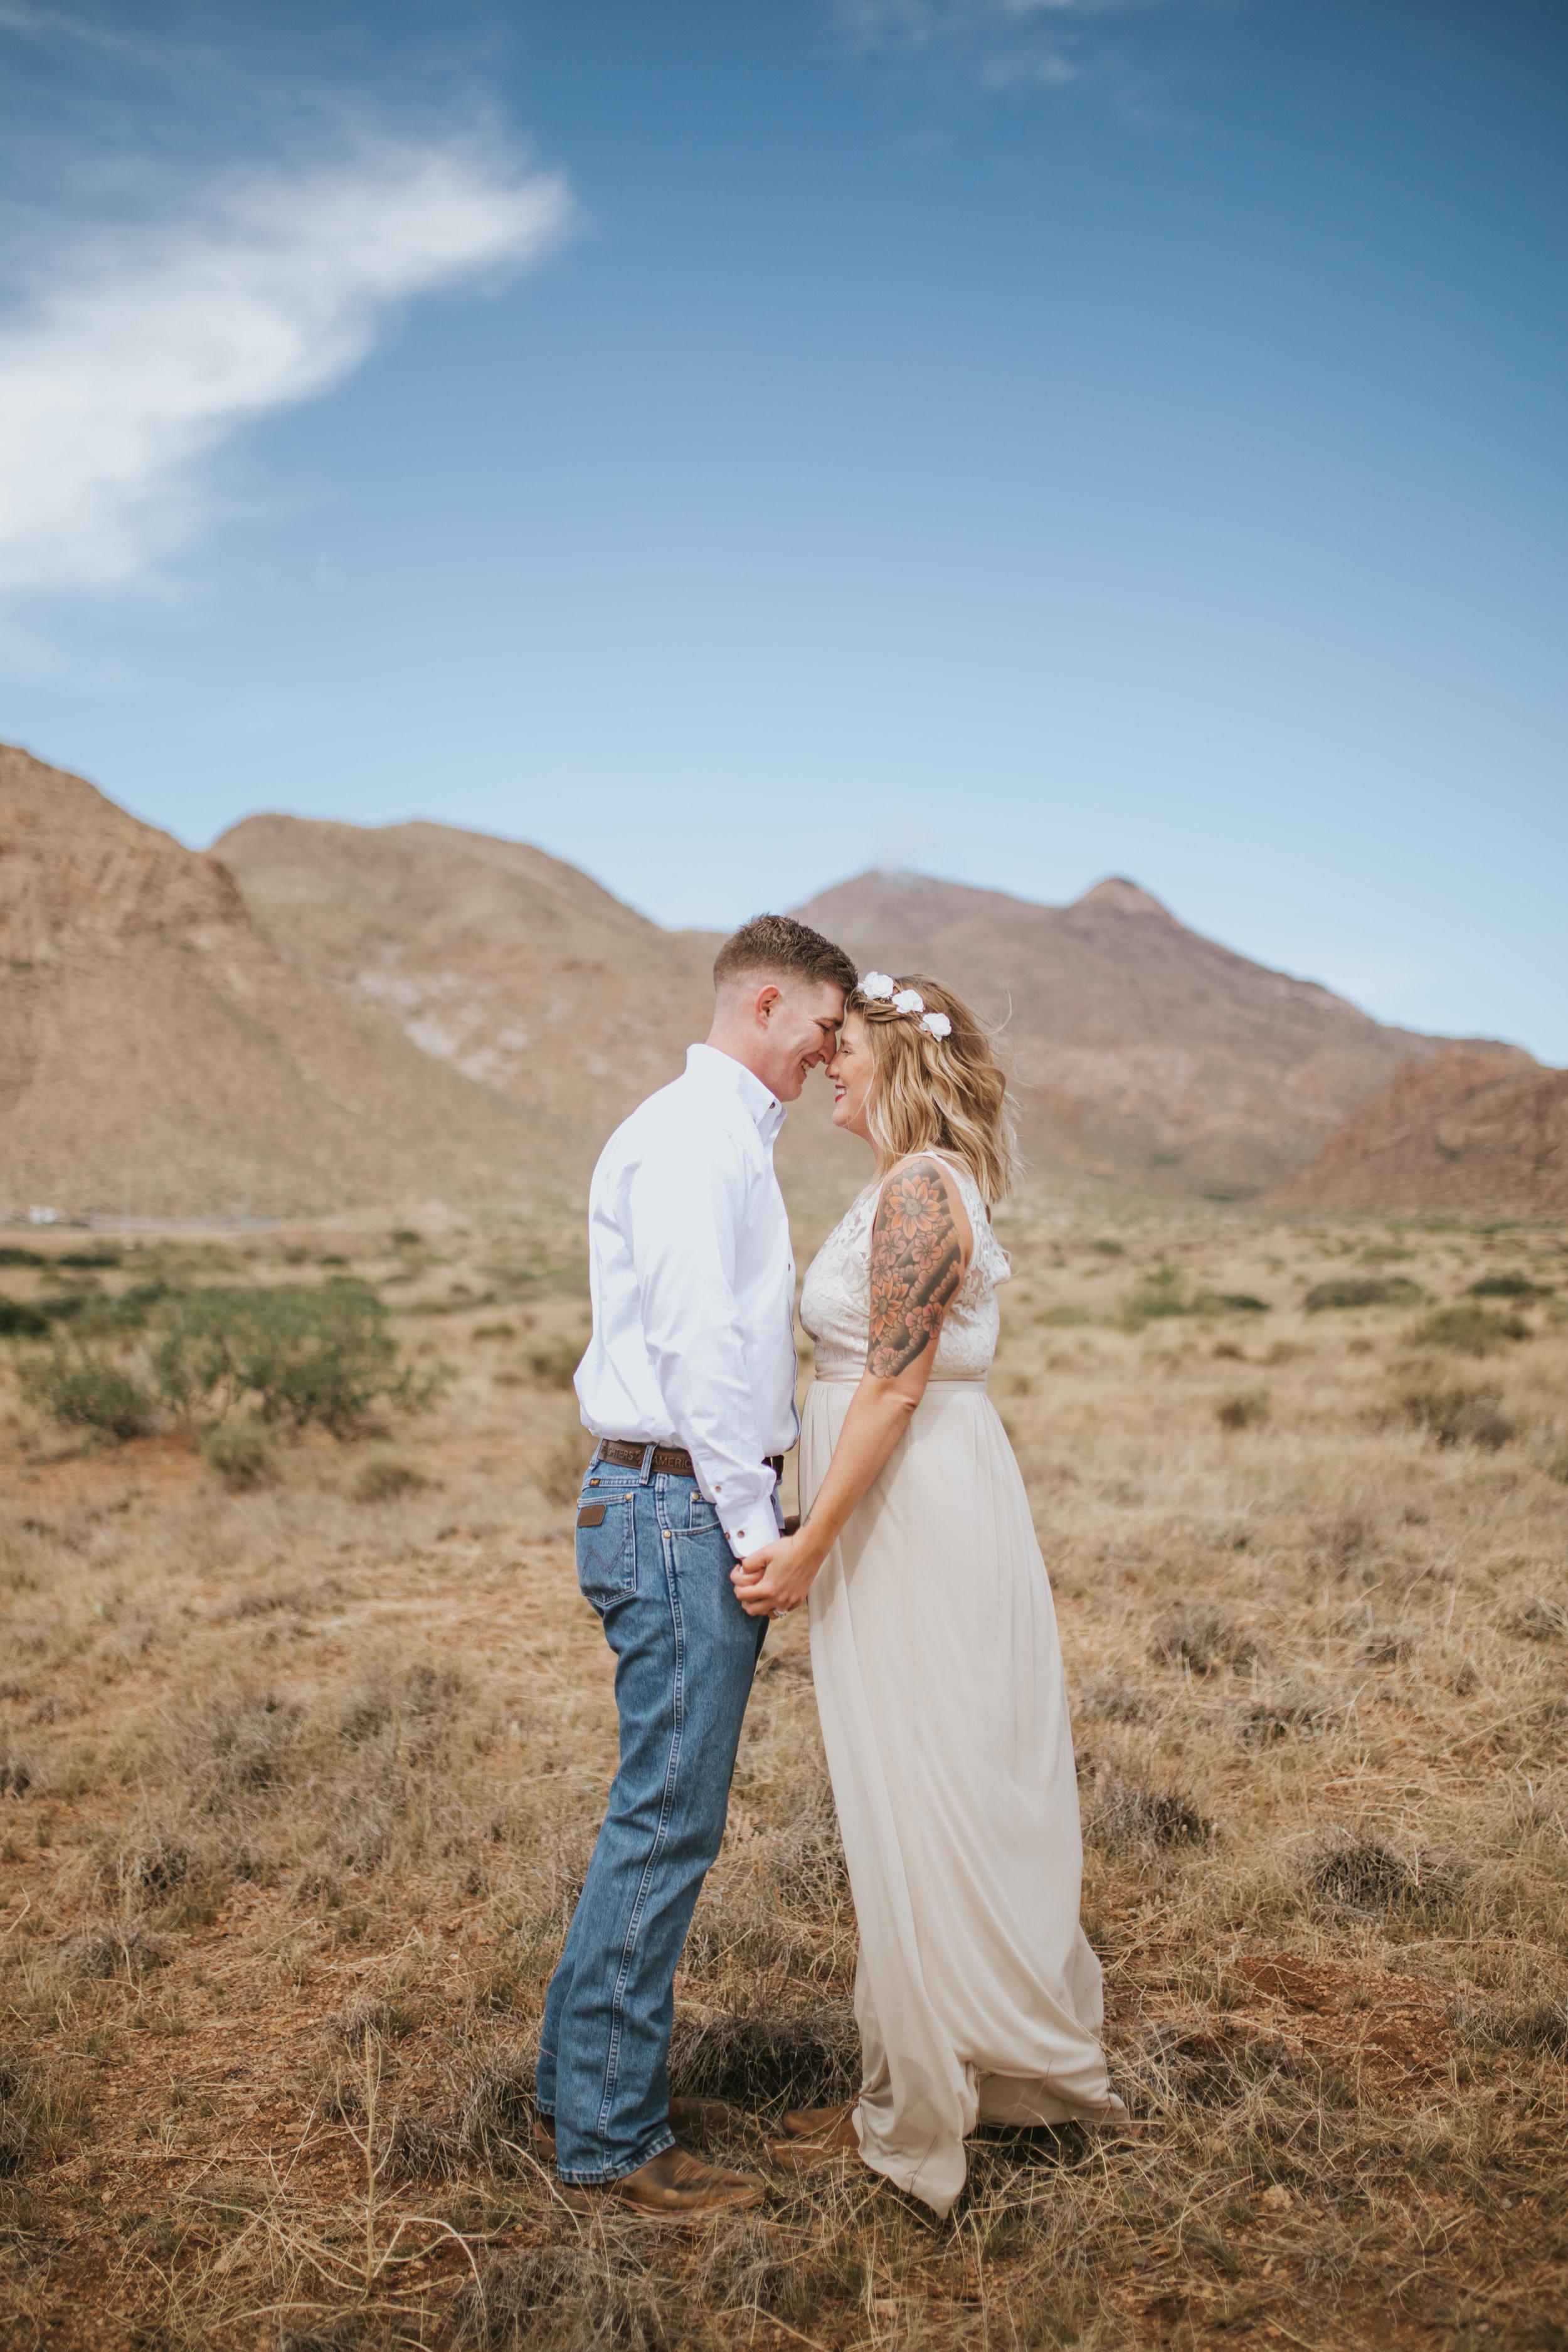 el-paso-texas-wedding-photographer-32